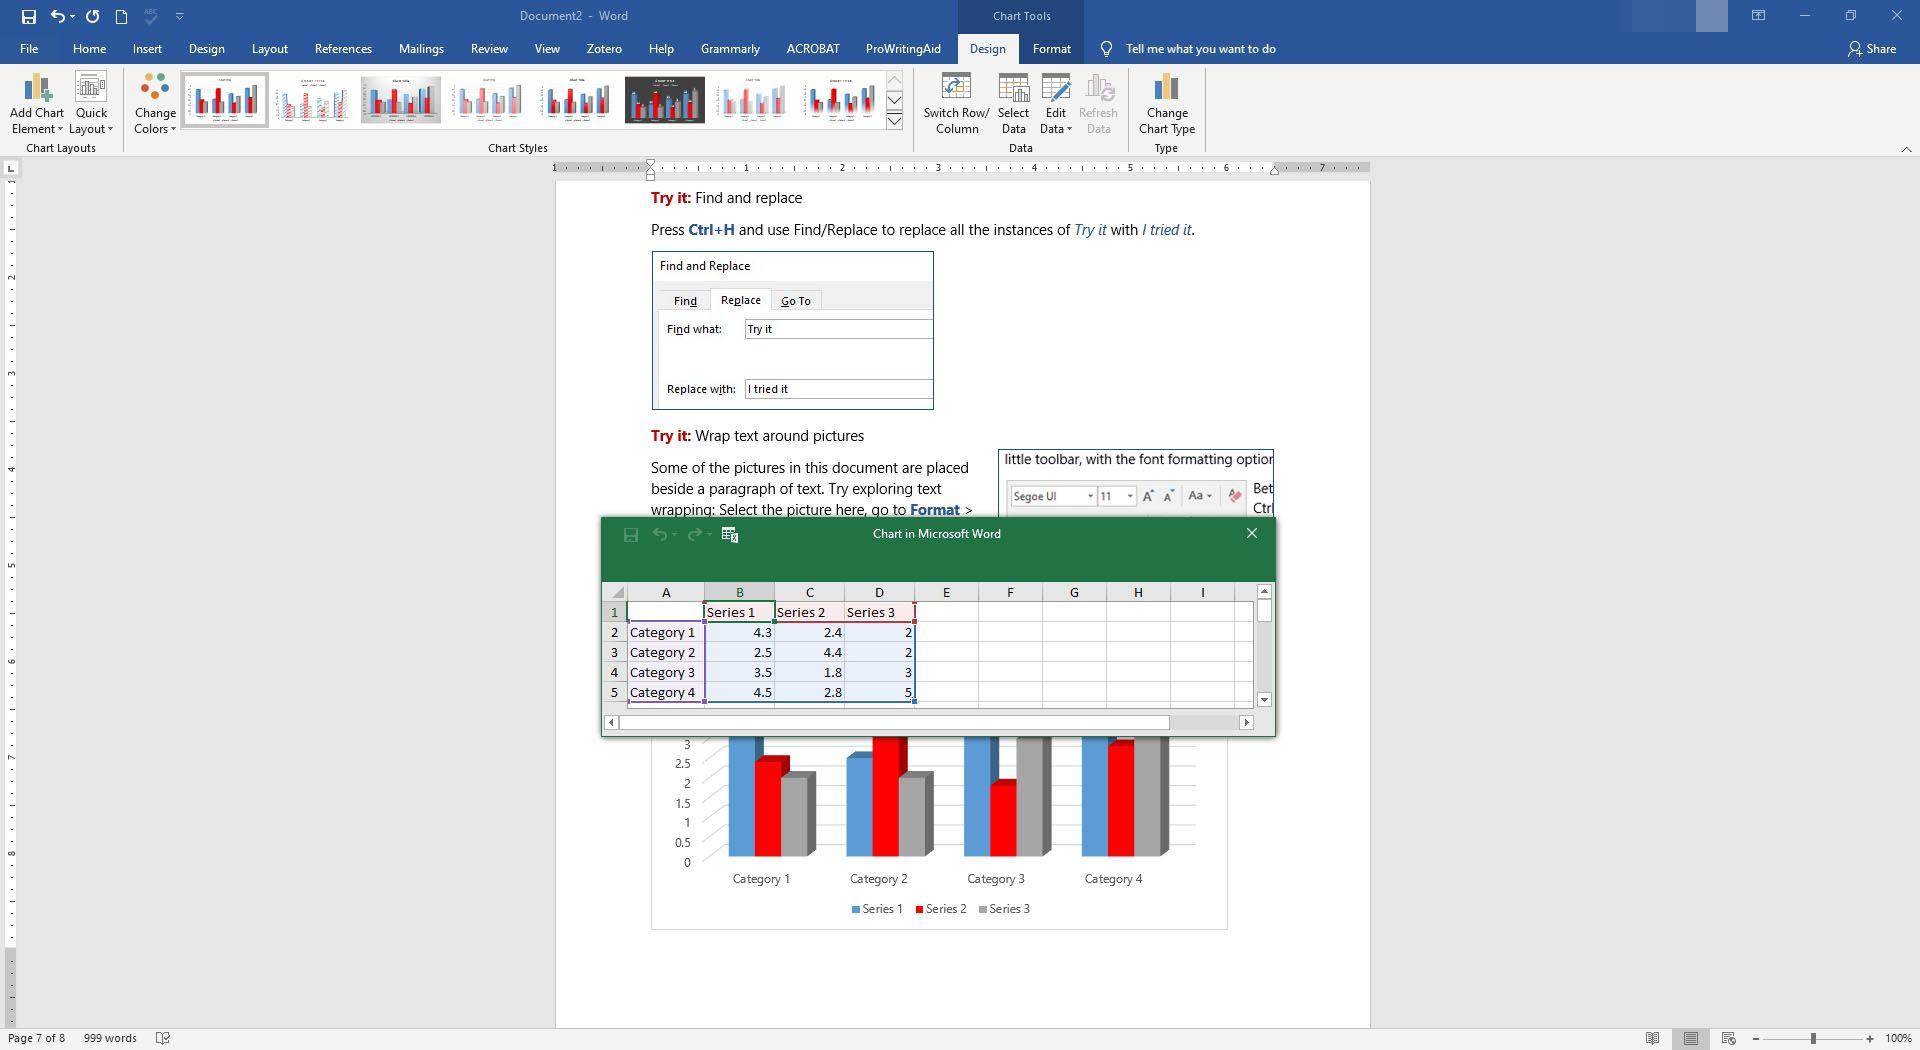 Entering in data into the mini spreadsheet in Microsoft Word.